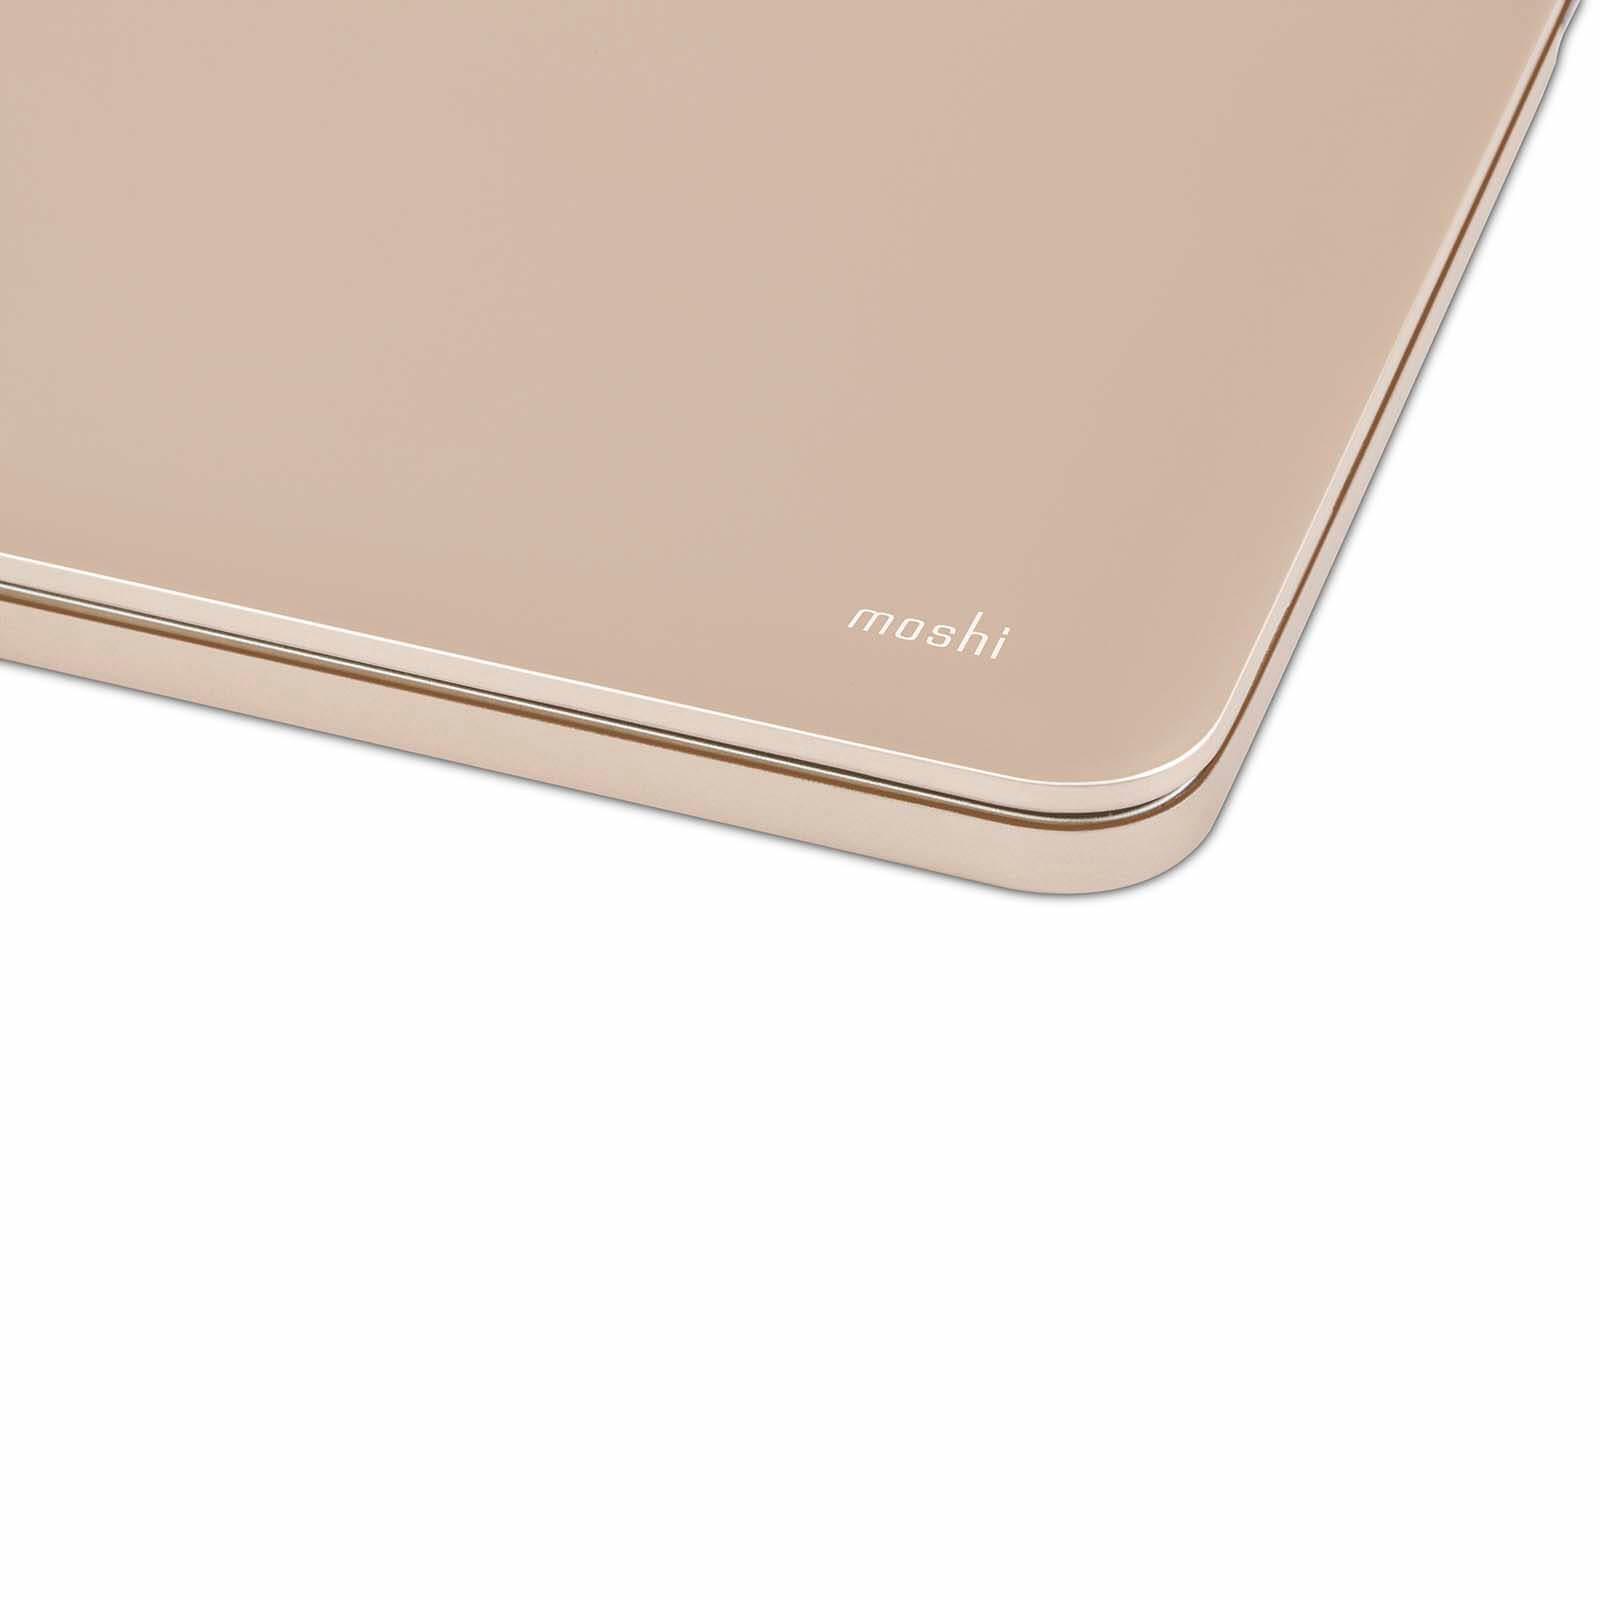 Moshi iGlaze Hard Case — предпазен кейс за MacBook Pro 13 Retina Display (златист) - 4